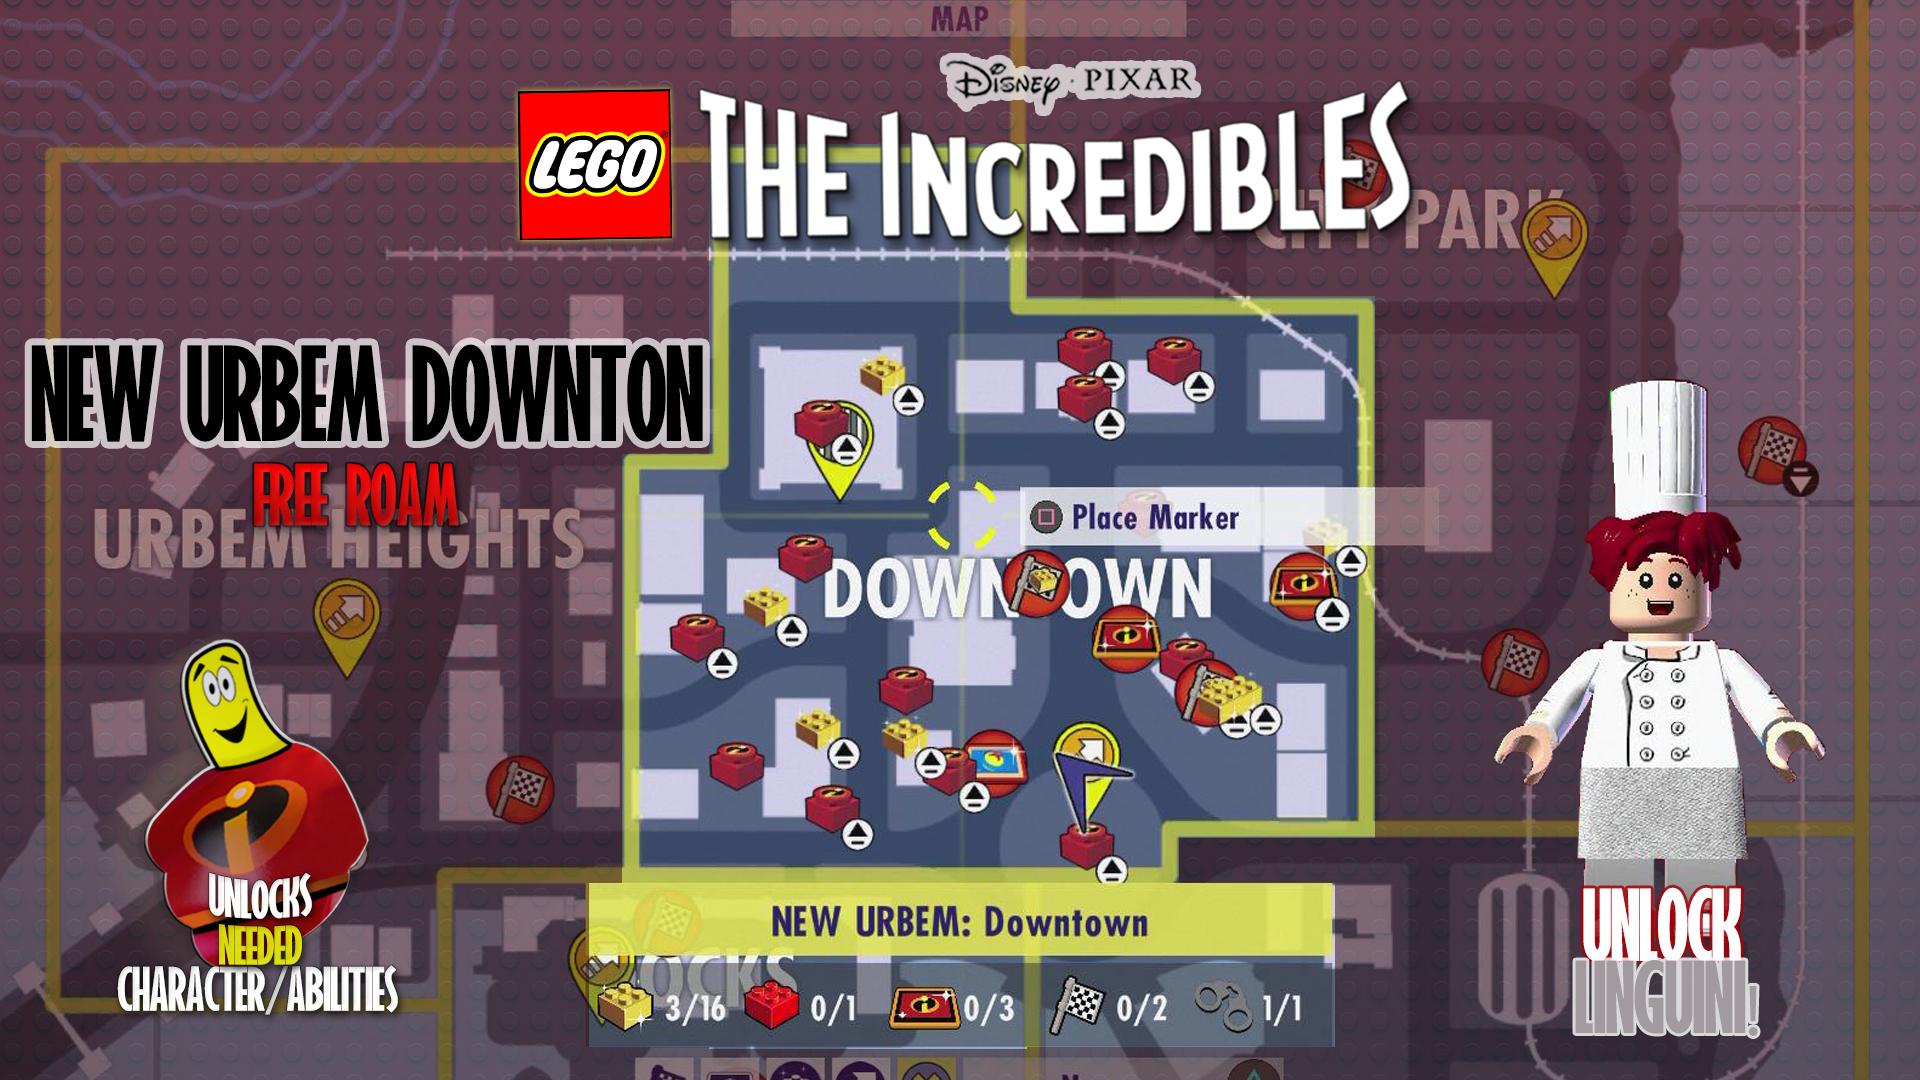 LegoIncredUrbemDowntownFREEROAM